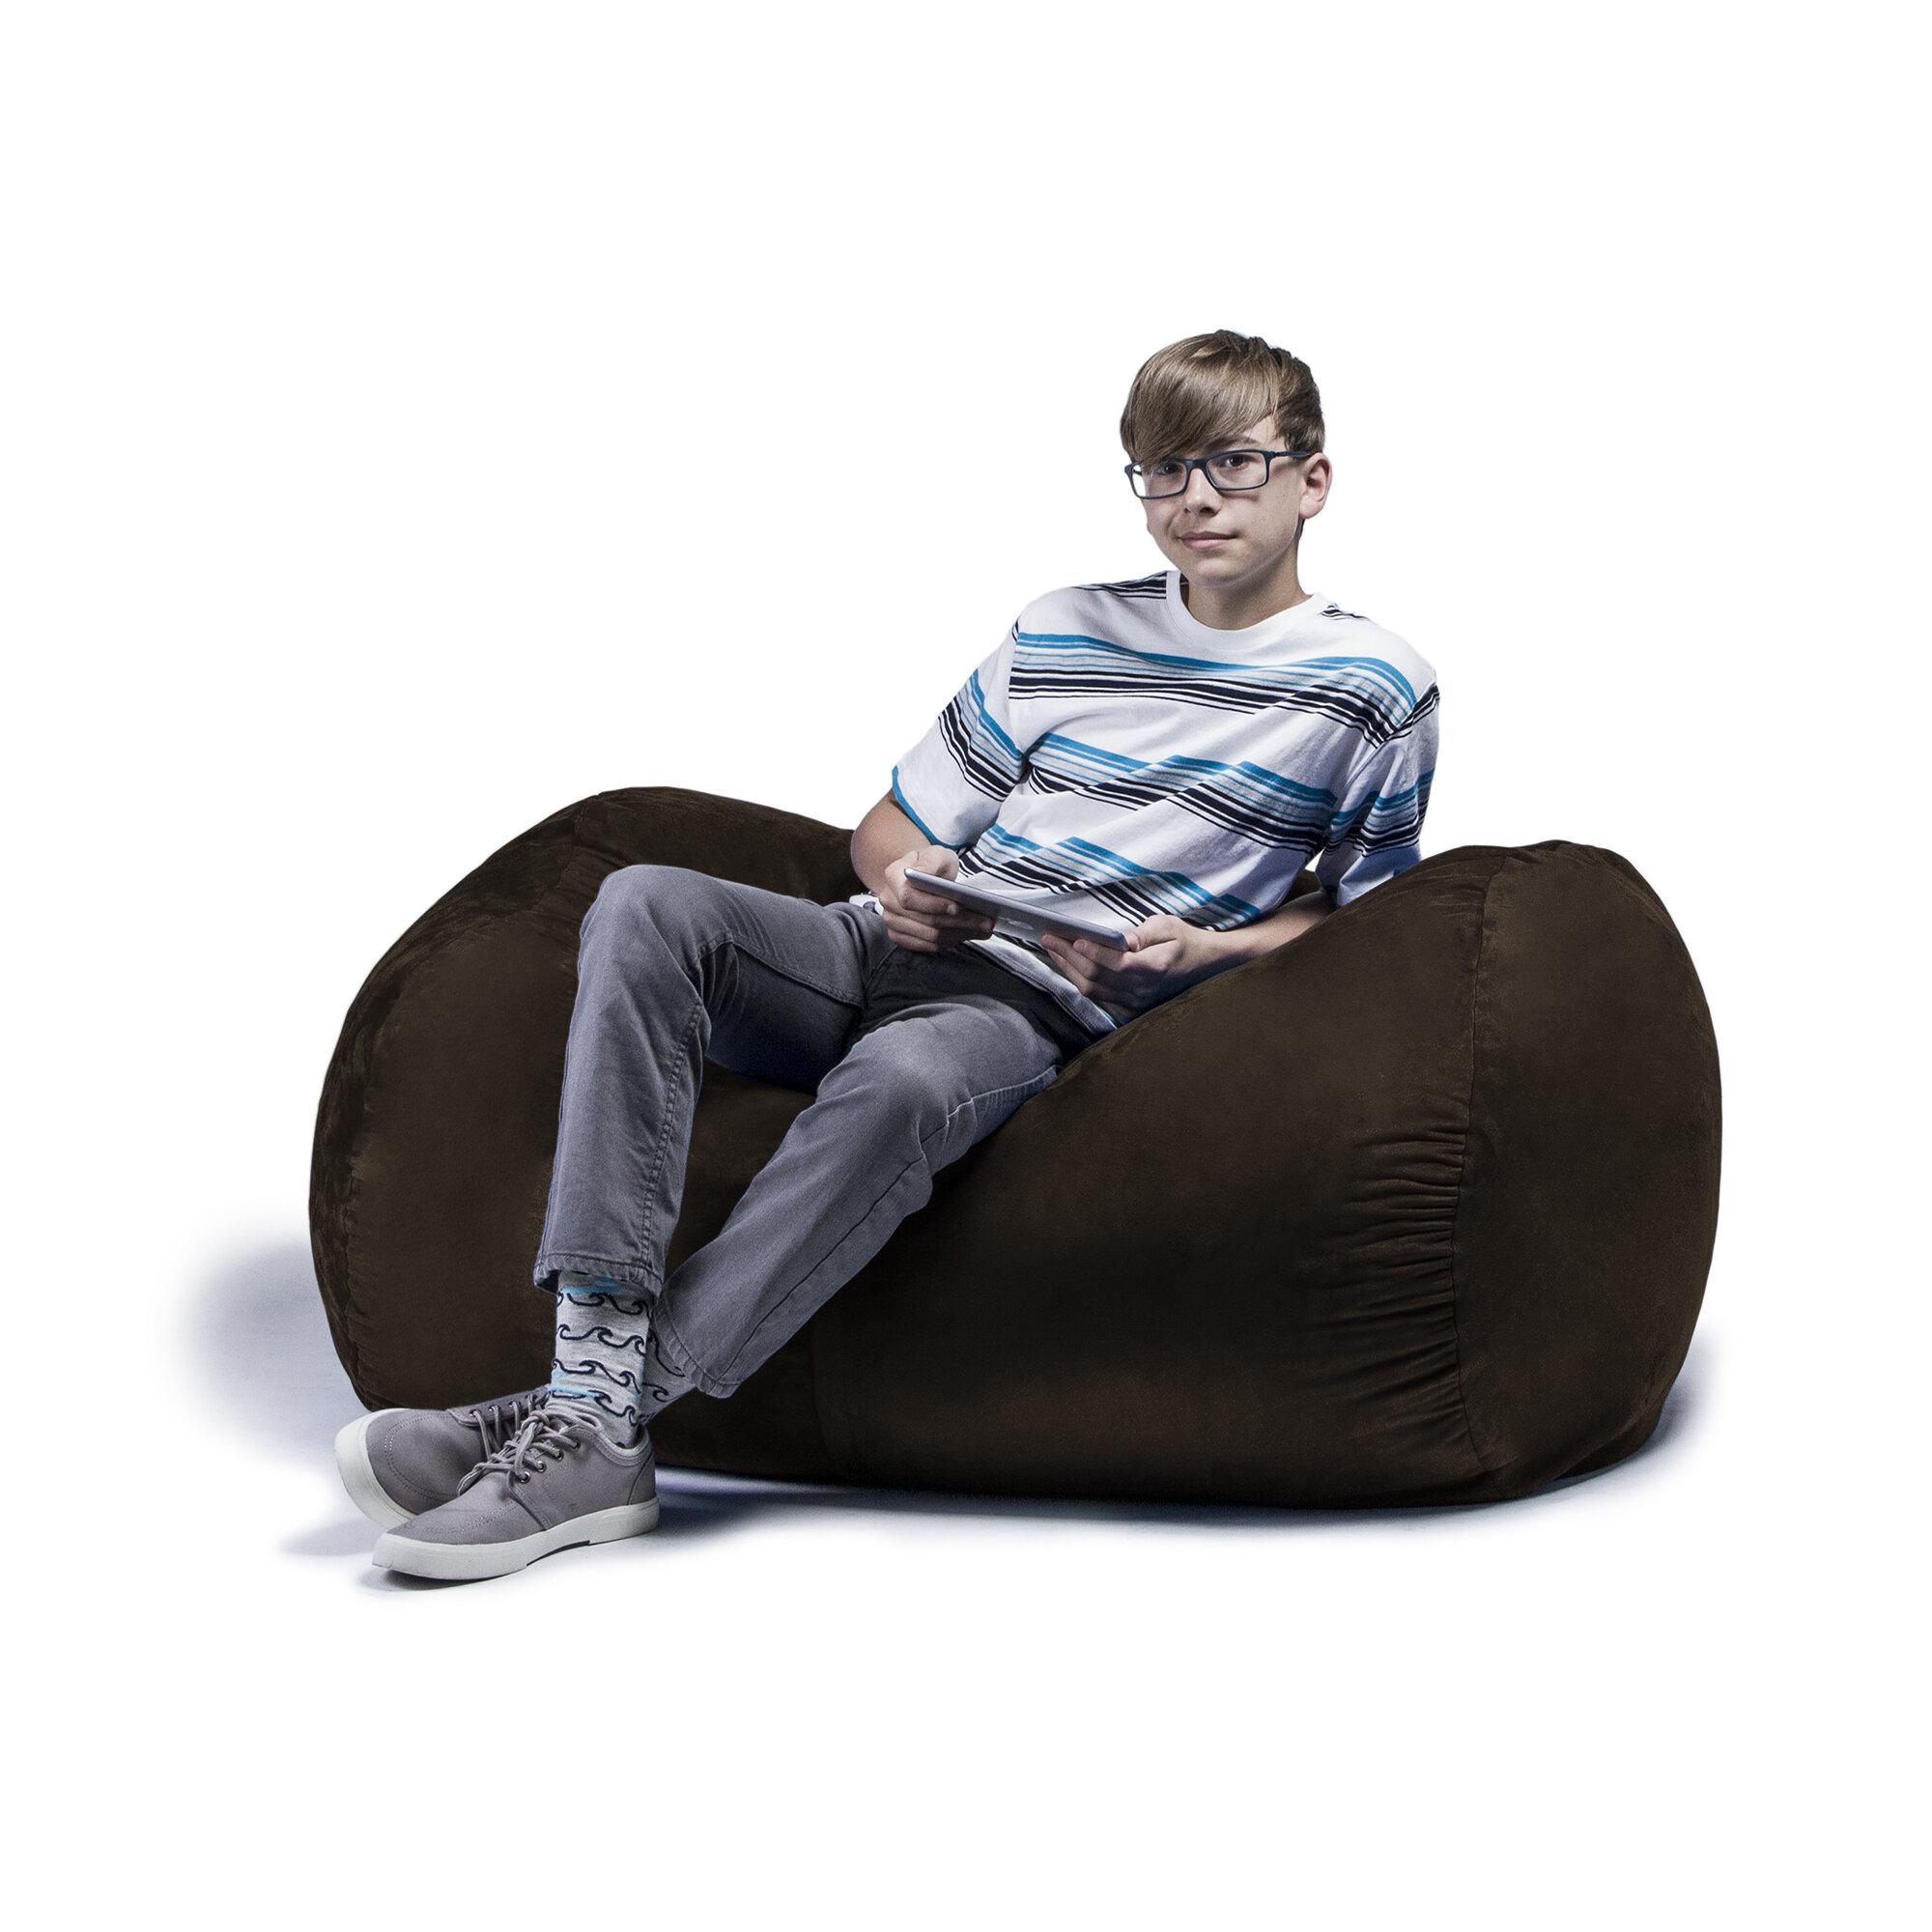 Marvelous Jaxx Jr Bean Bag Lounger Unemploymentrelief Wooden Chair Designs For Living Room Unemploymentrelieforg